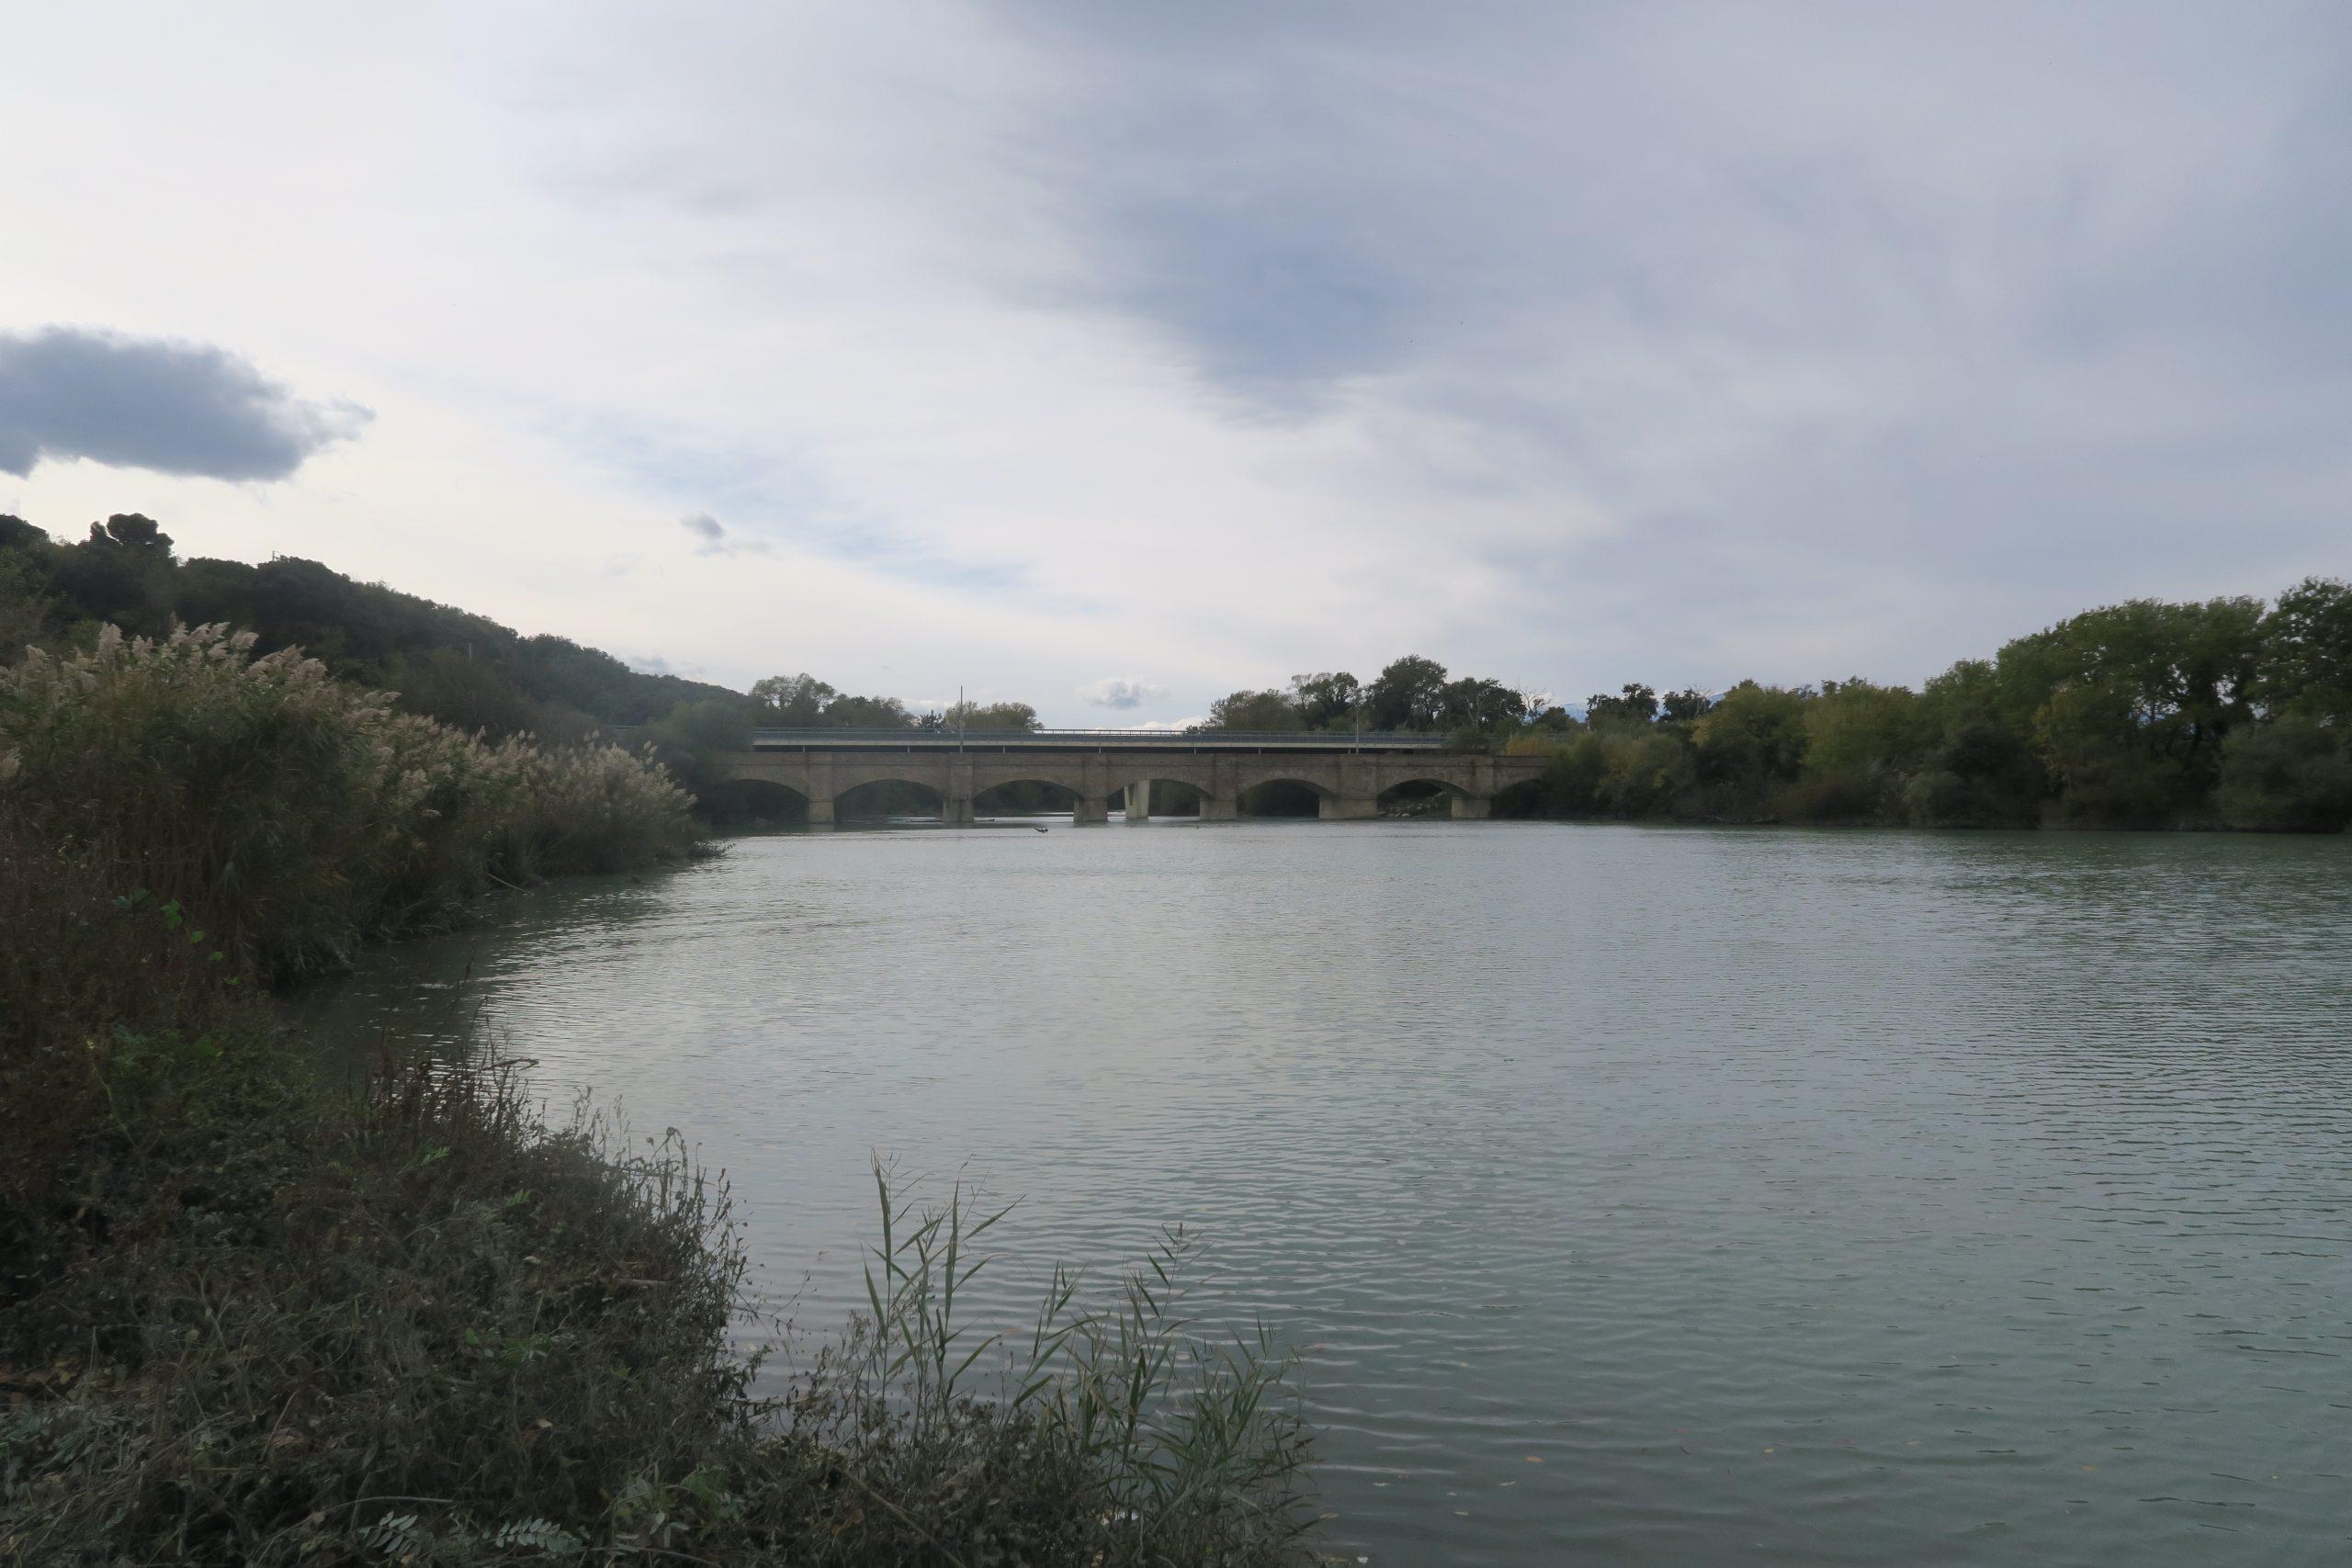 Torino di Sangro_7